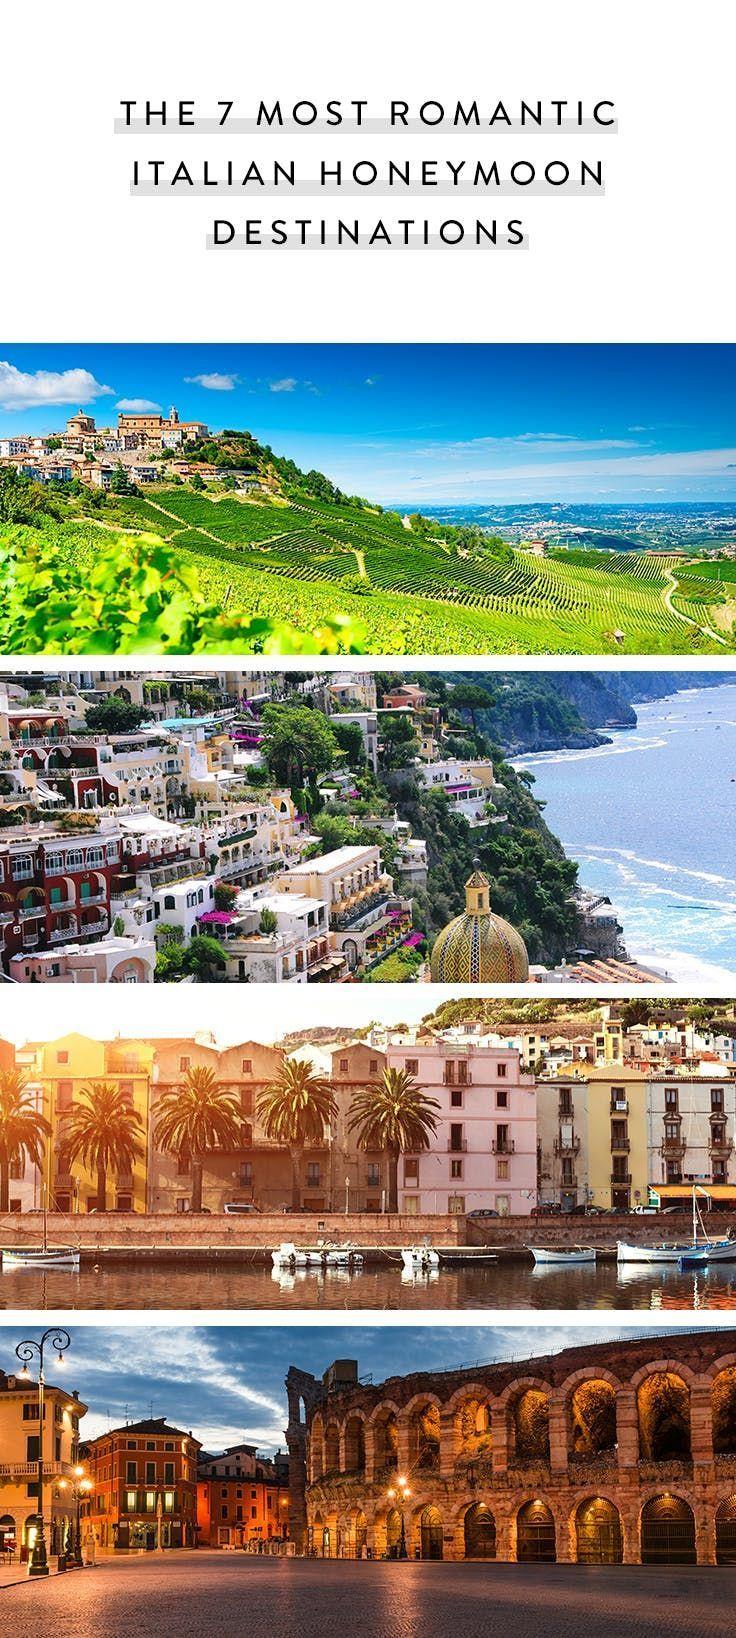 The 7 Most Romantic Italian Honeymoon Destinations Via